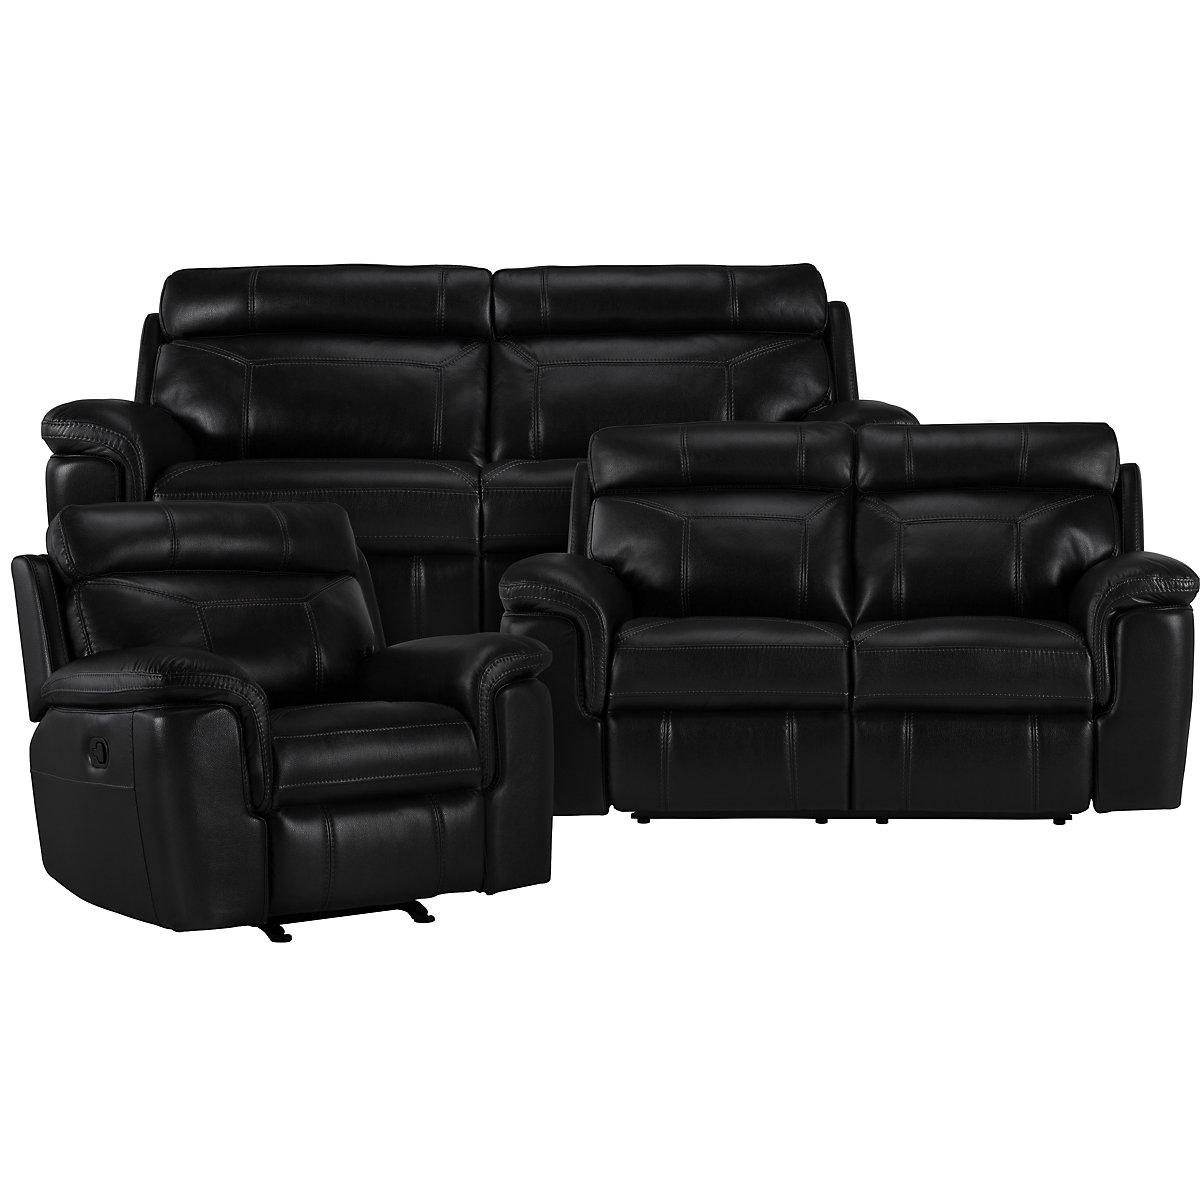 Gamma Black Microfiber Manually Reclining Living Room